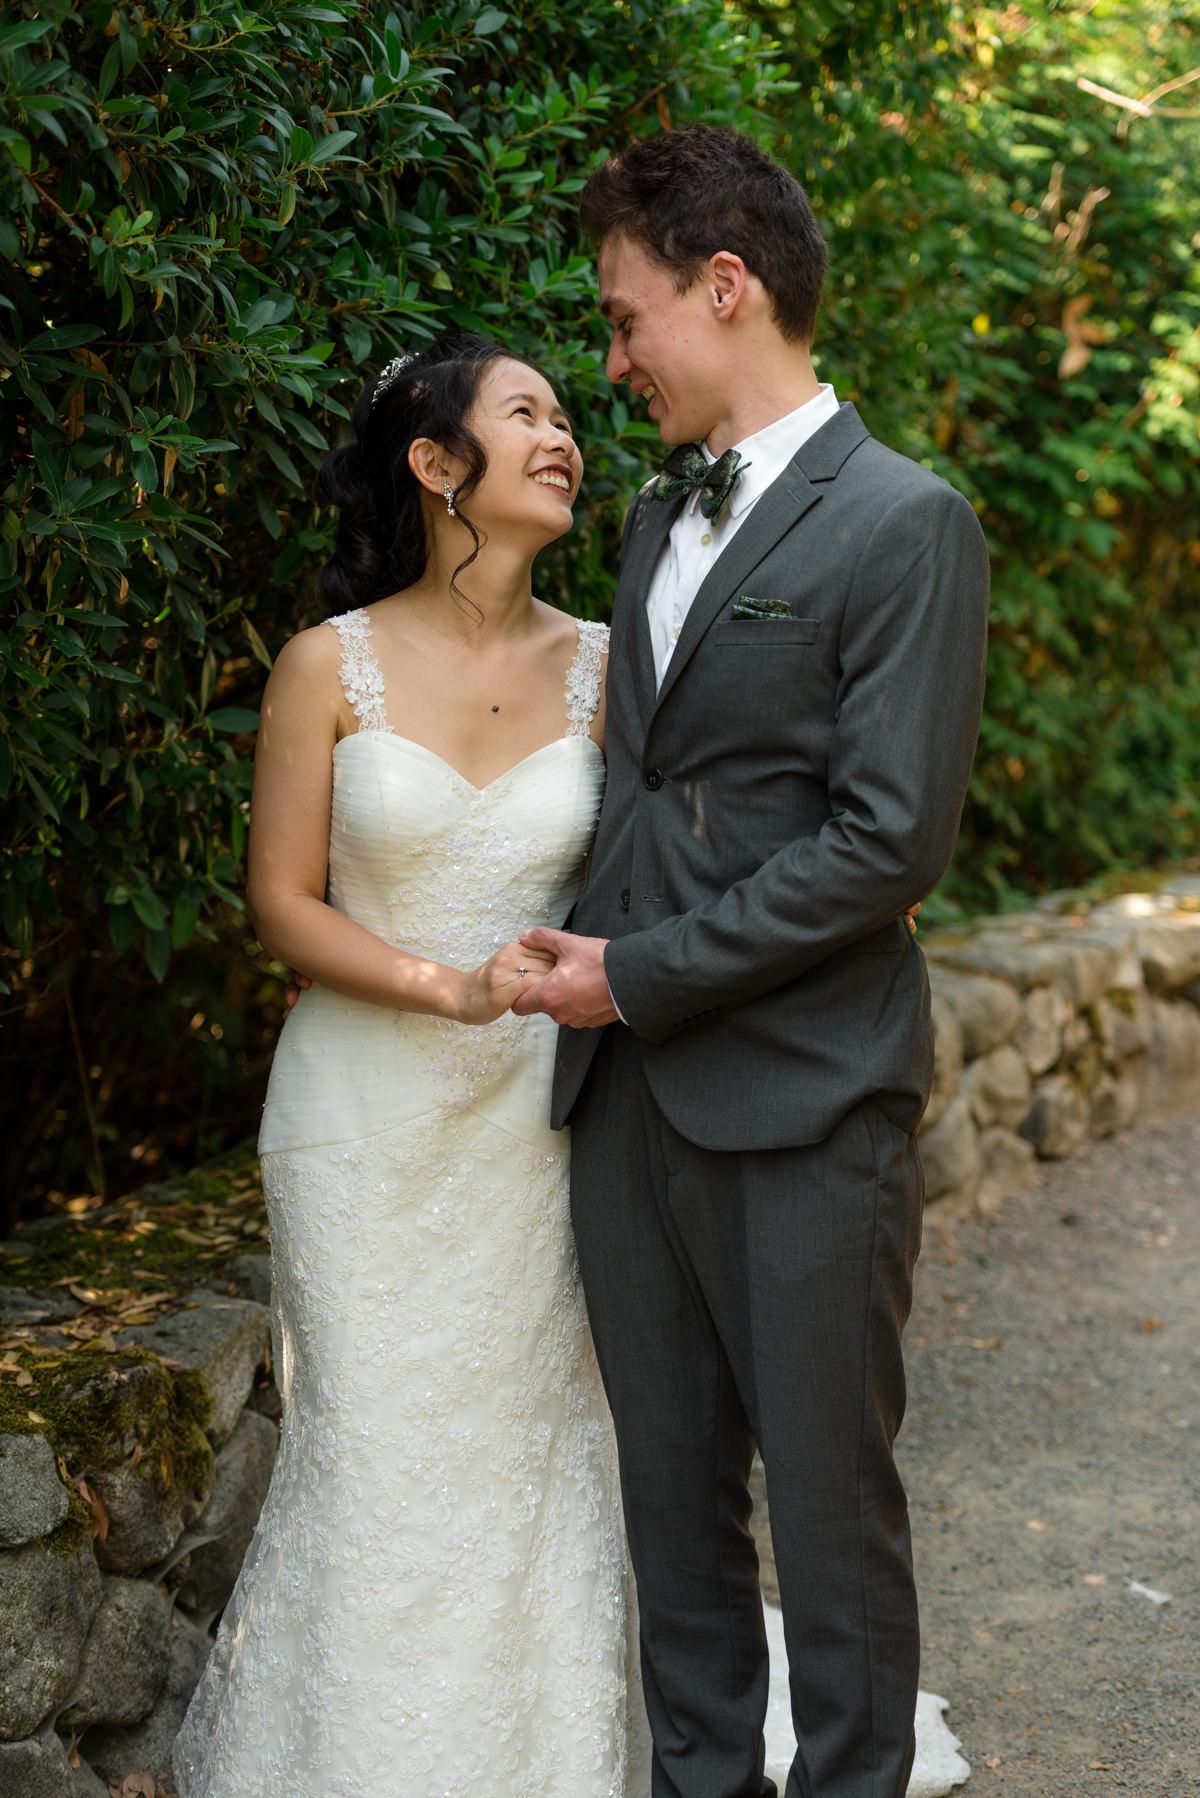 Andrew Tat - Documentary Wedding Photography - Heritage Hall - Kirkland, Washington - Grace & James - 05.JPG